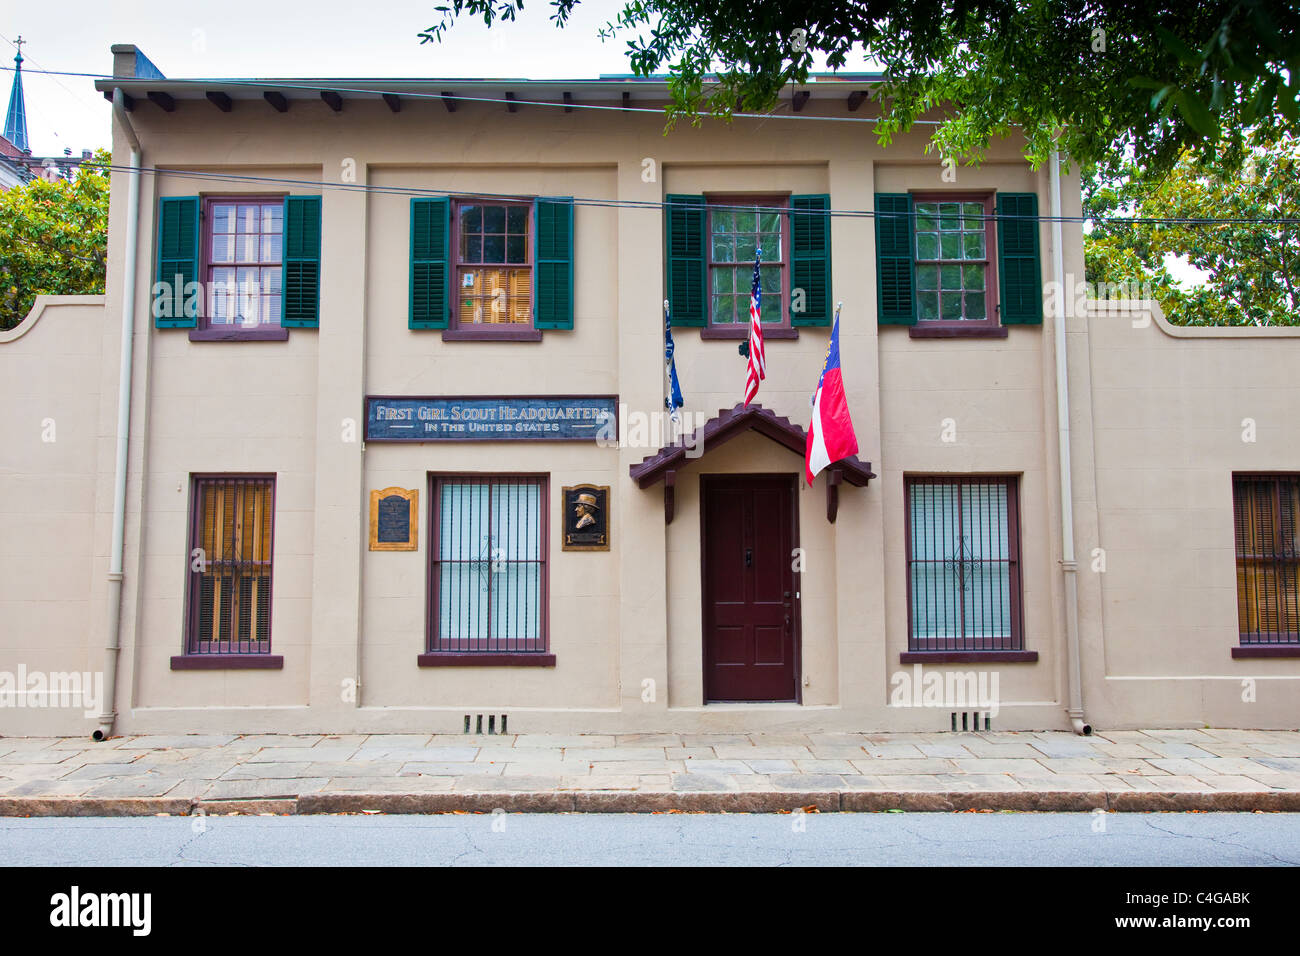 First Girl Scout Headquarters in America, Savannah, Georgia - Stock Image